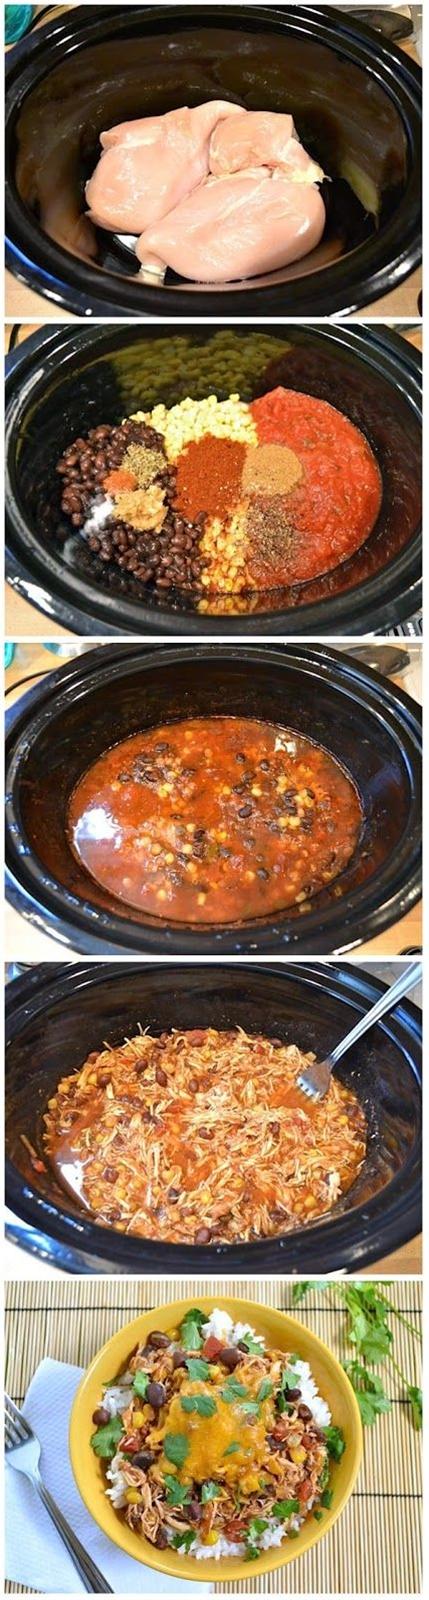 Ingredients:  1½ lbs. chicken breasts,  1 (16 oz.) jar salsa,  1 (15 oz.) can black beans, drained,  ½ lb. (8 oz.) frozen corn,  1 Tbsp chili powder,  ½ Tbsp cumin,  ½ Tbsp minced garlic,  ½ tsp dried oregano,  ¼ tsp cayenne pepper,  ¼ tsp salt,  to taste cracked pepper,  2 cups dry rice,  8 oz. shredded cheddar,  ½ bunch cilantro (optional.